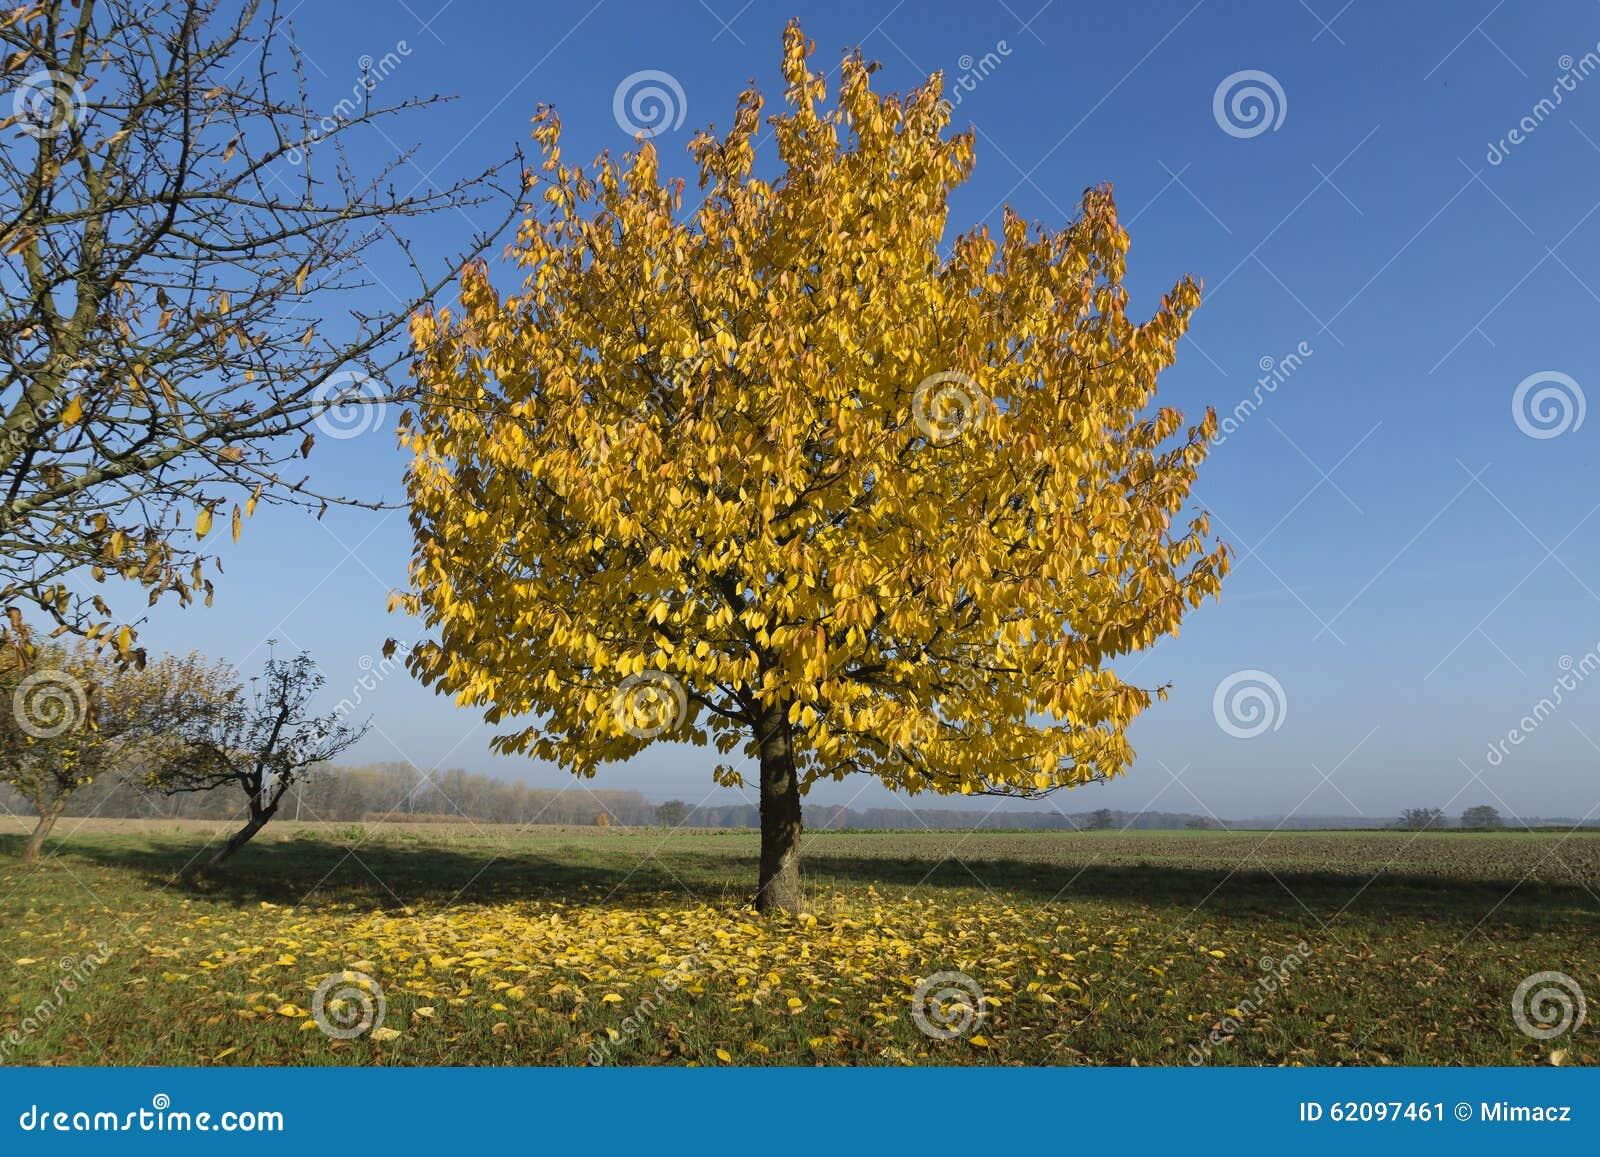 Ortensie Foglie Gialle : Albero con le belle foglie gialle immagine stock